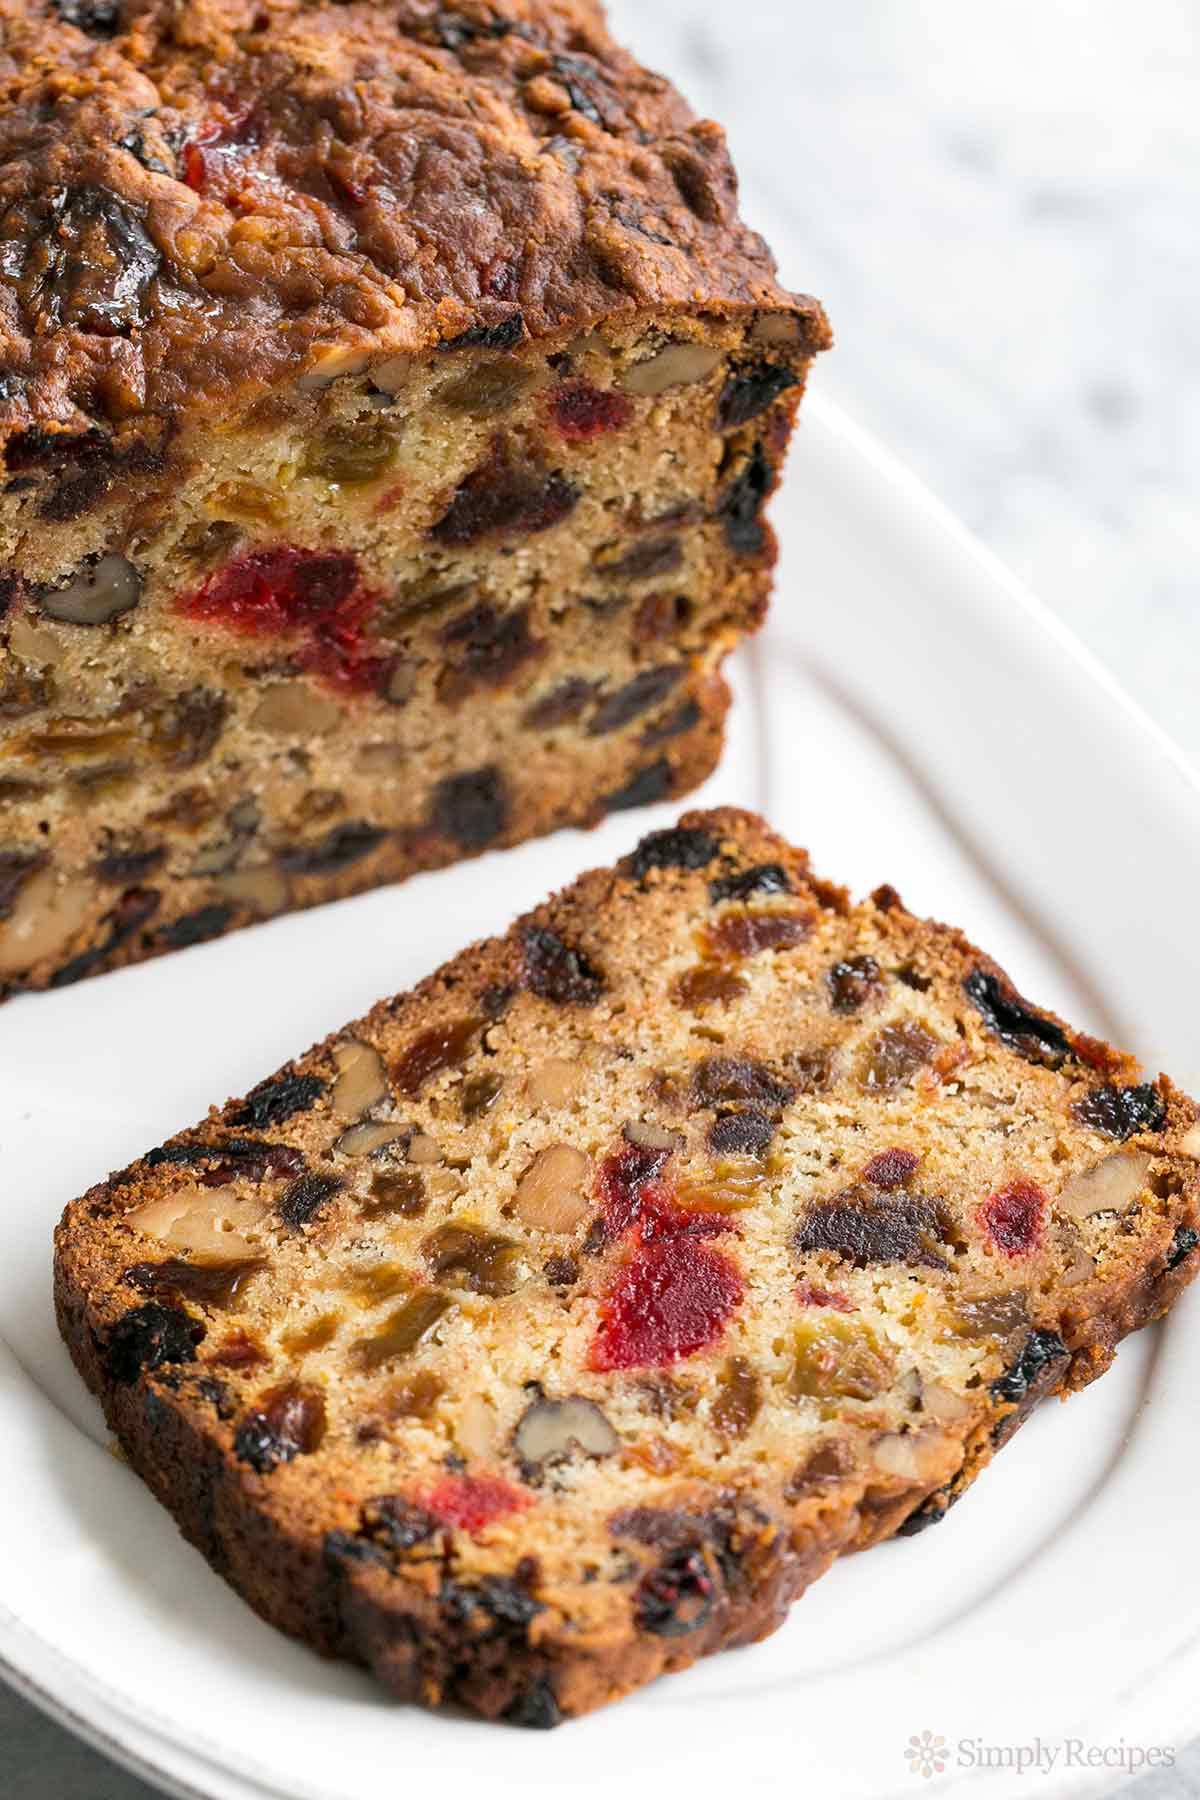 Fruit Cake Recipe Easy  Our Favorite Holiday Fruitcake Recipe